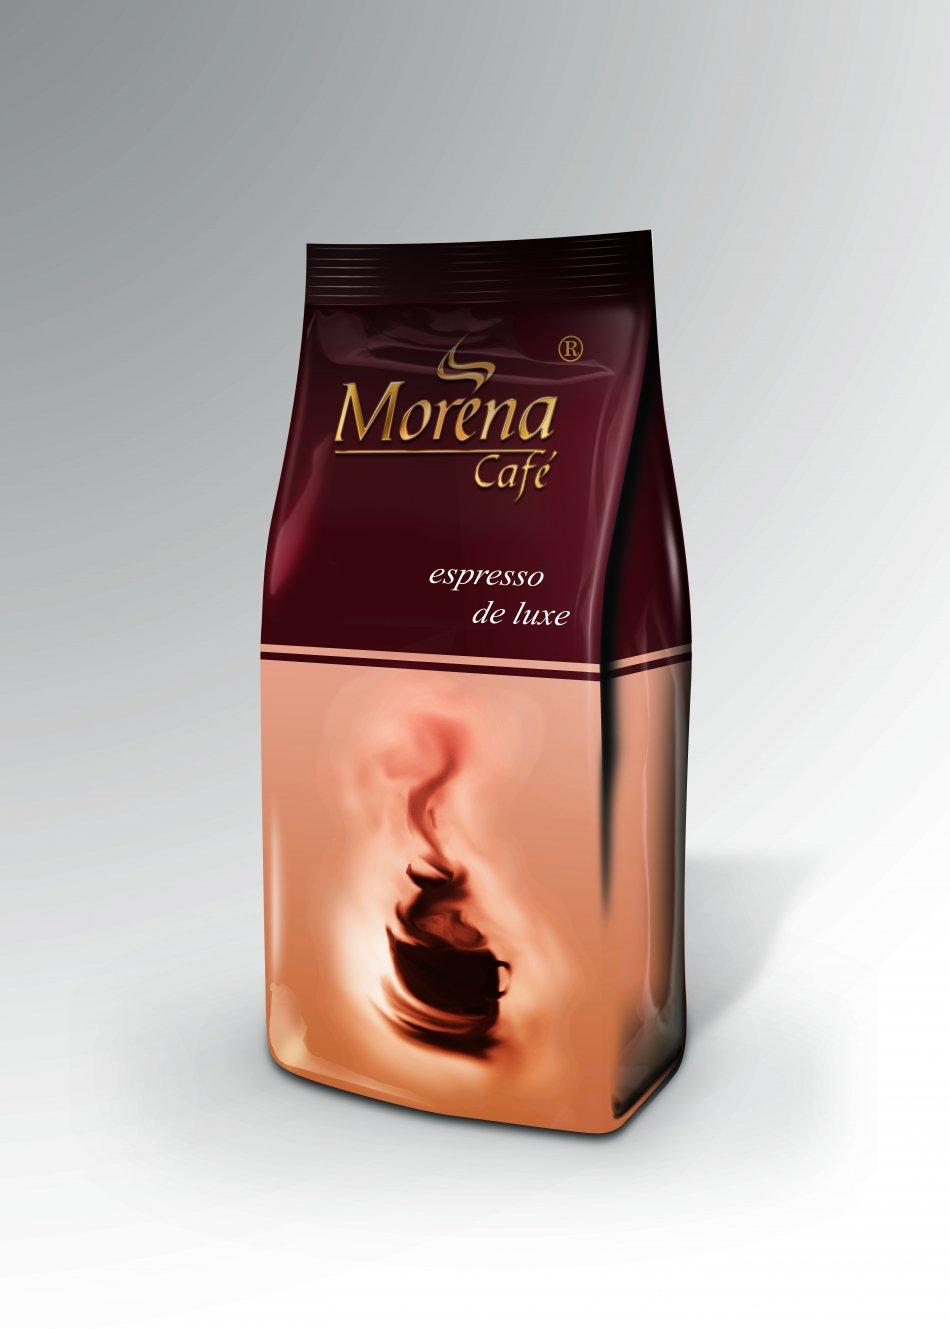 Morena cafe Espresso de luxe 1kg.